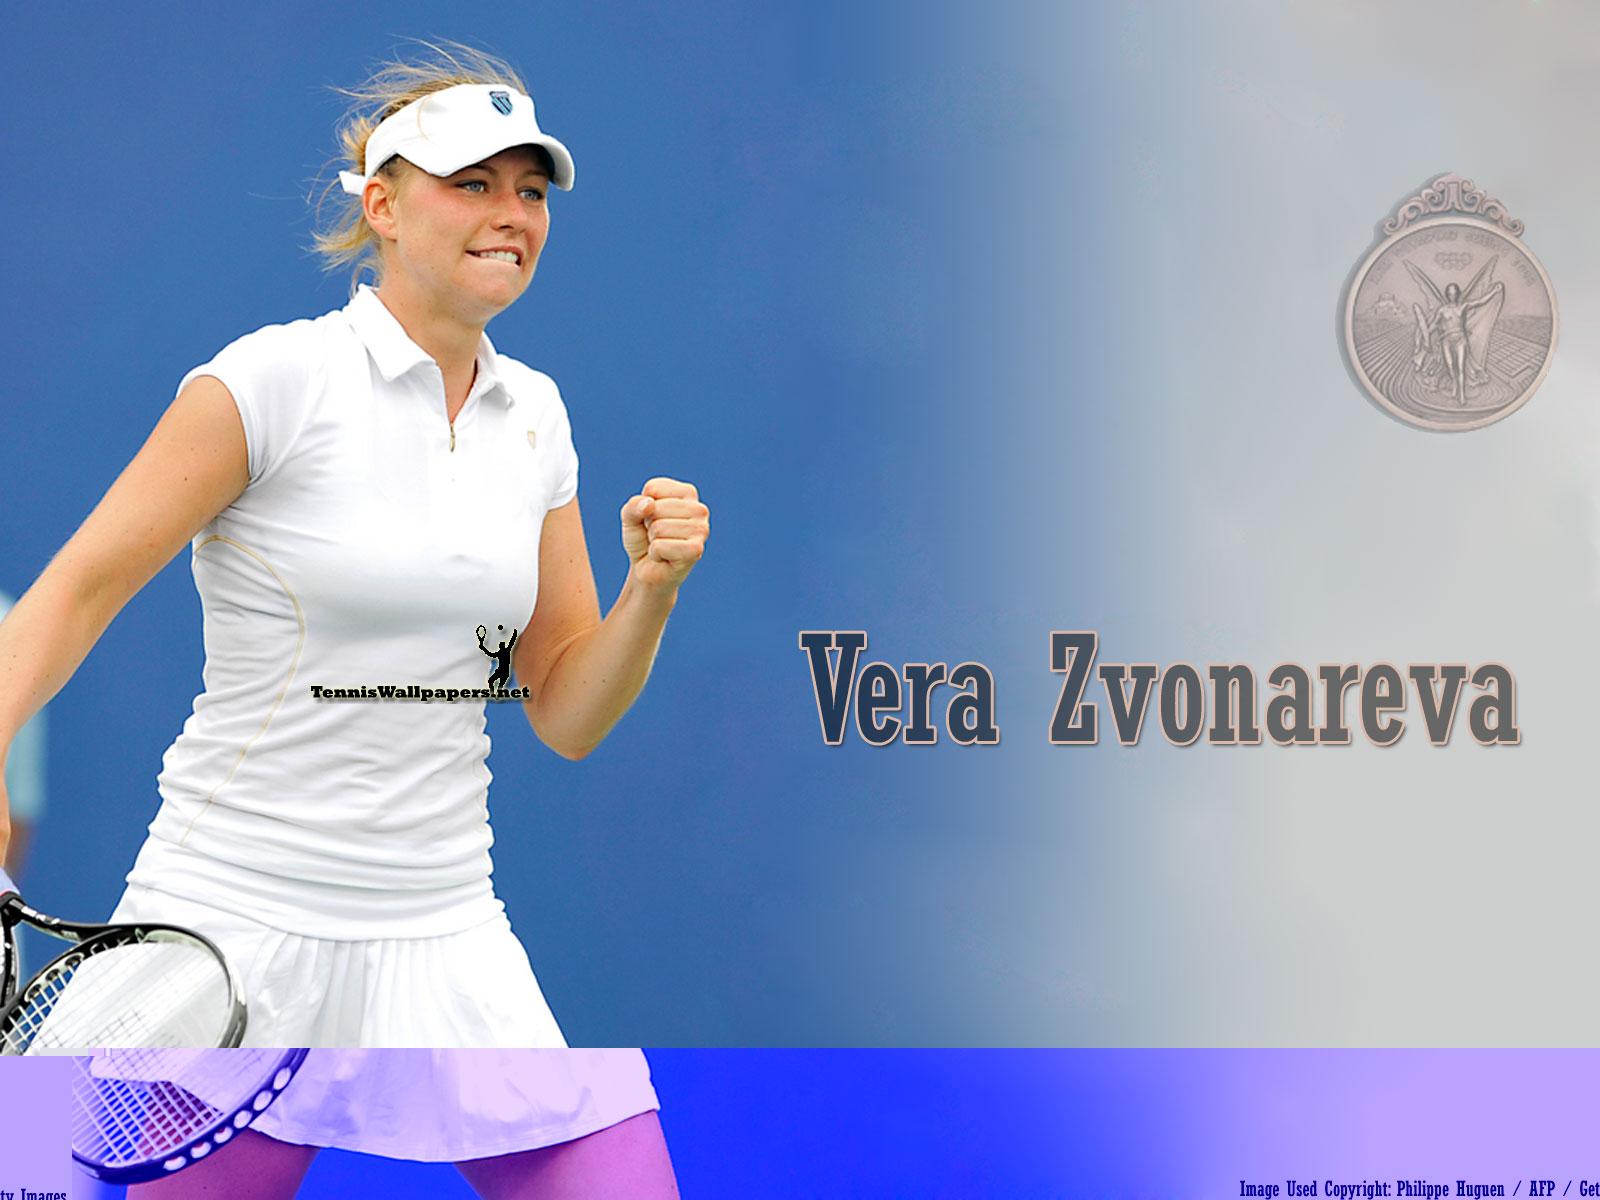 http://4.bp.blogspot.com/_TcwbPuj2SZ0/TLsMHHLaIoI/AAAAAAAASy4/8SMaNQE4N_U/s1600/Vera+Zvonareva+Tennis+Wallpaper.jpg